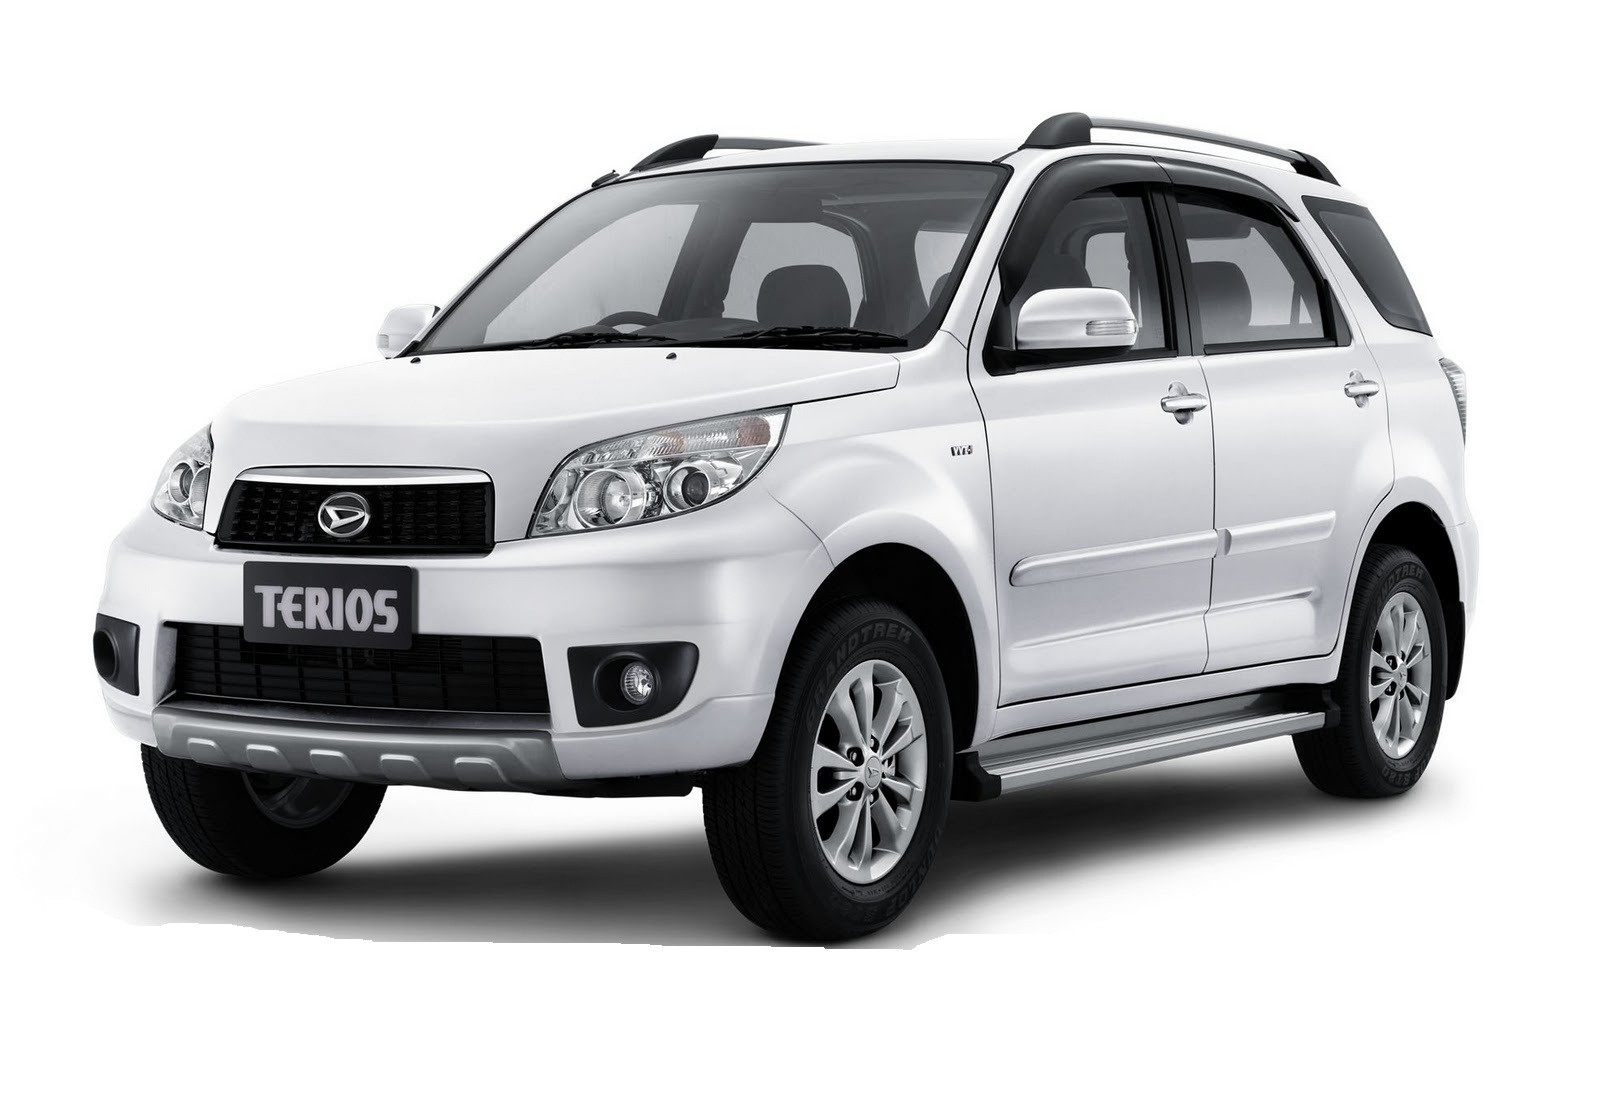 Rental Mobil Daihatsu Terios Sleman